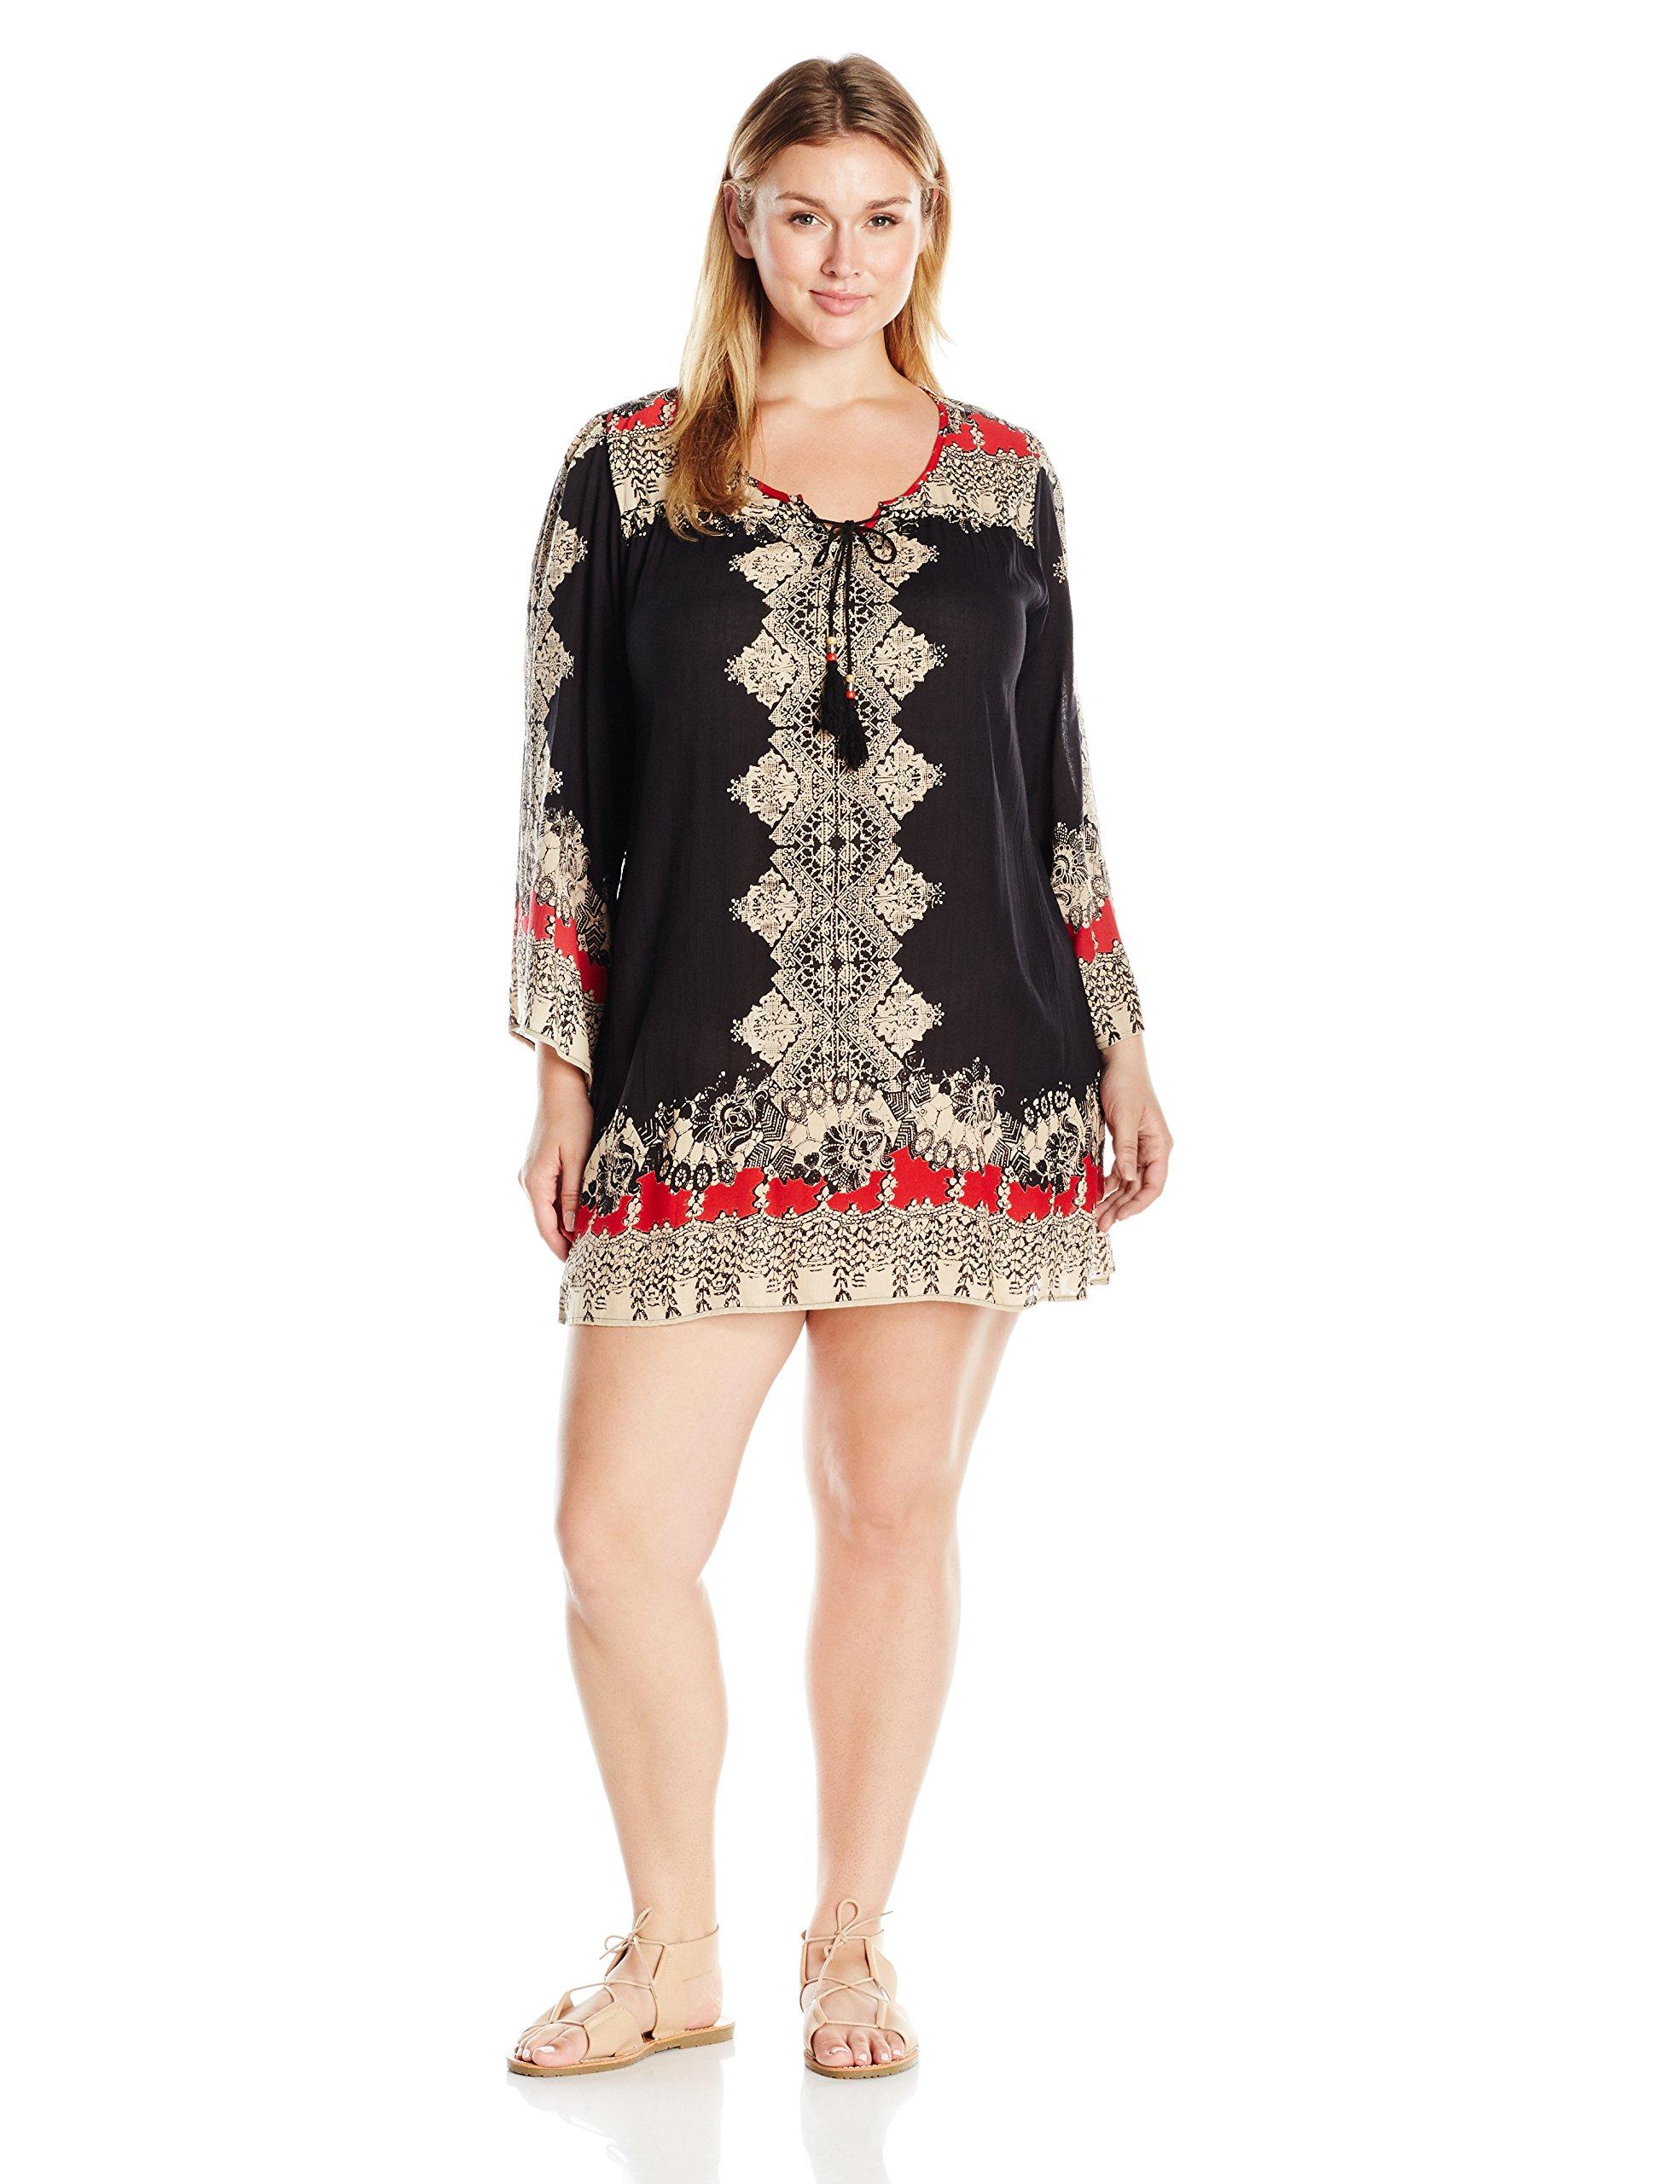 Angie Women's Plus Size Black Printed Bell Sleeve Dress, Black/Sand, 1X